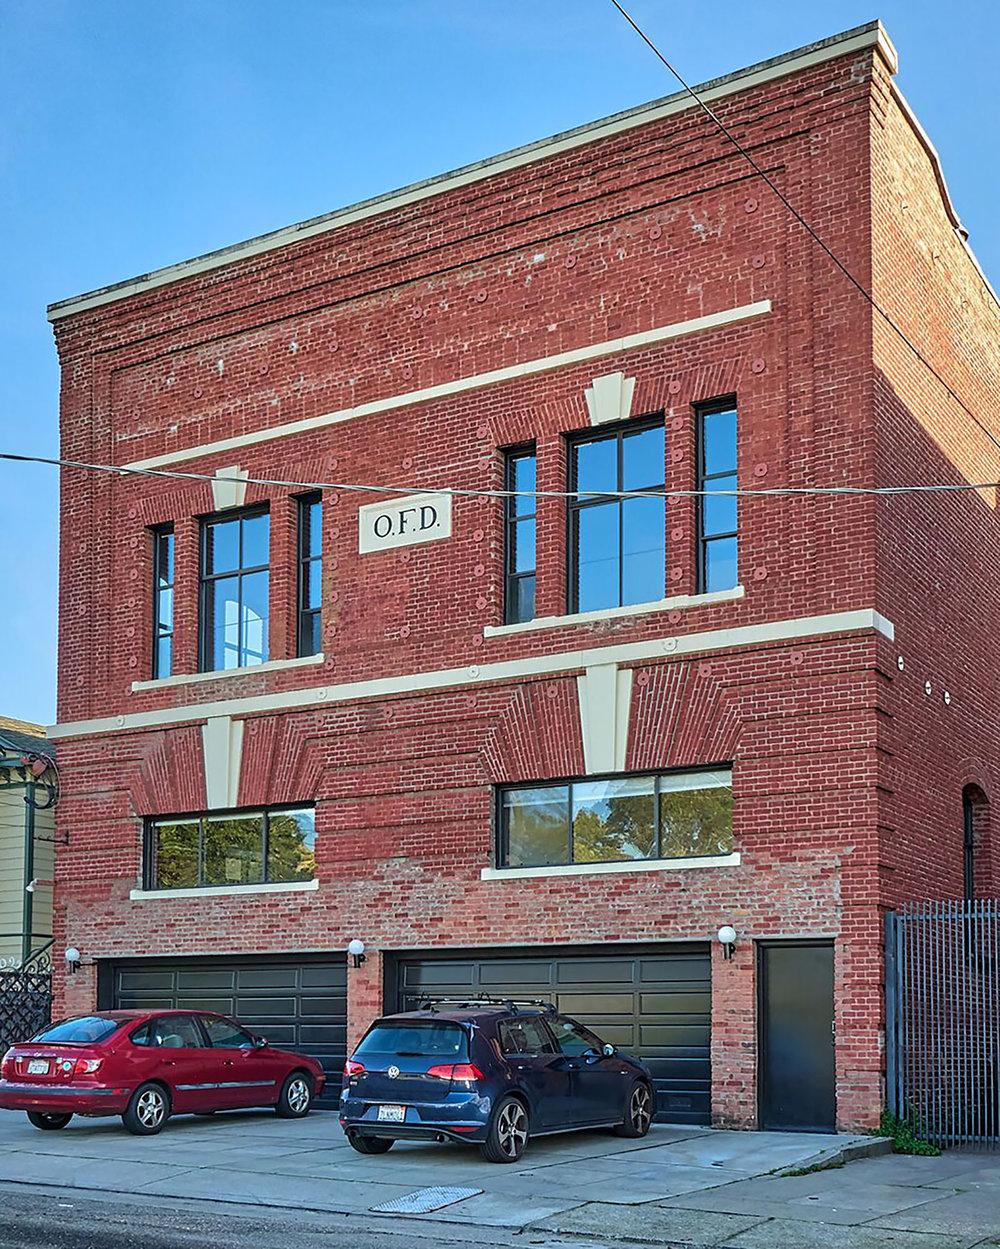 1095_59th_historic_firehouse_oakland